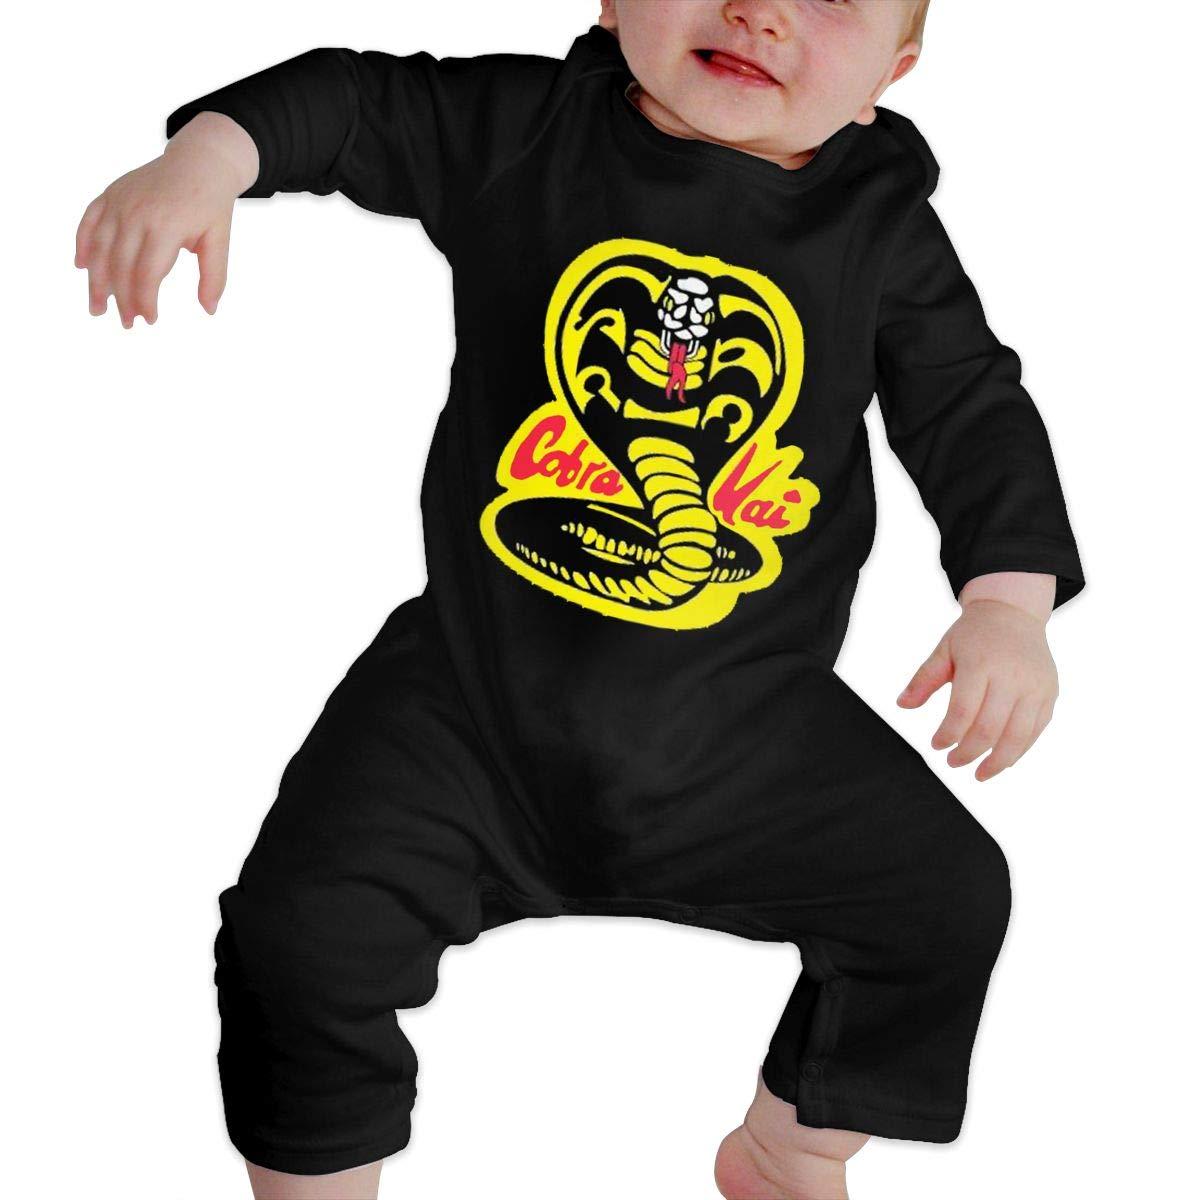 Fional Infant Long Sleeve Romper Cobra-Kai-Denim-Dad Newborn Babys 0-24M Organic Cotton Jumpsuit Outfit